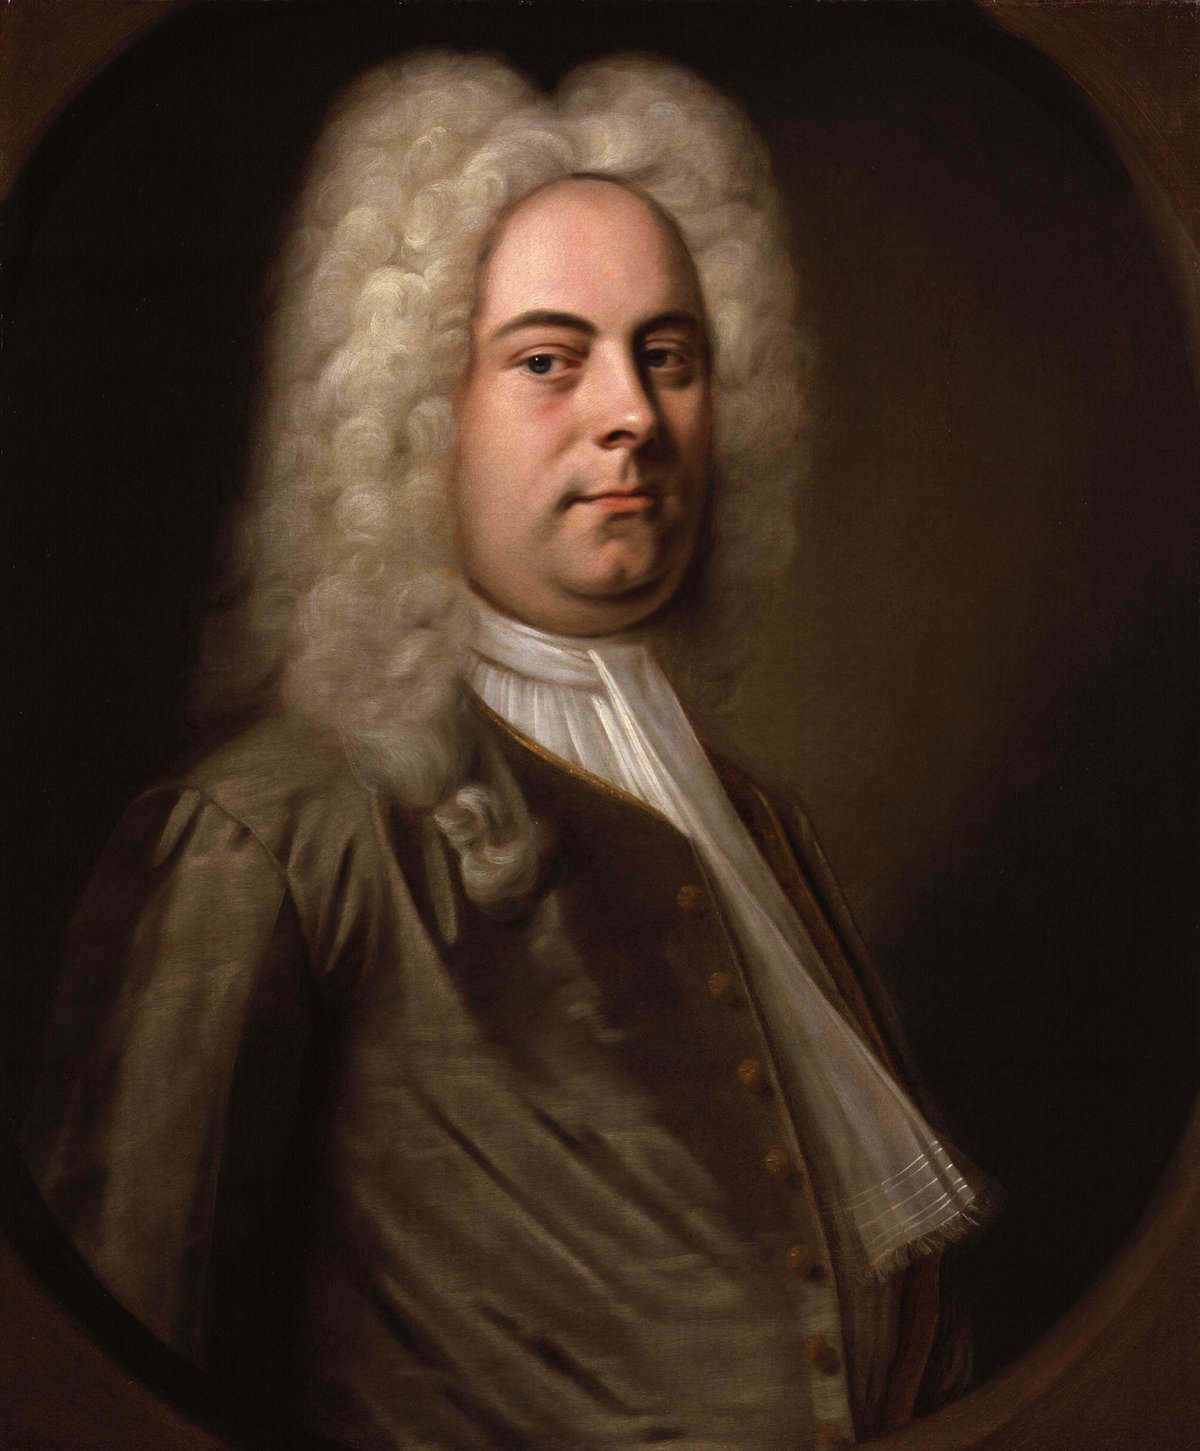 Gambar: George Frederic Handel